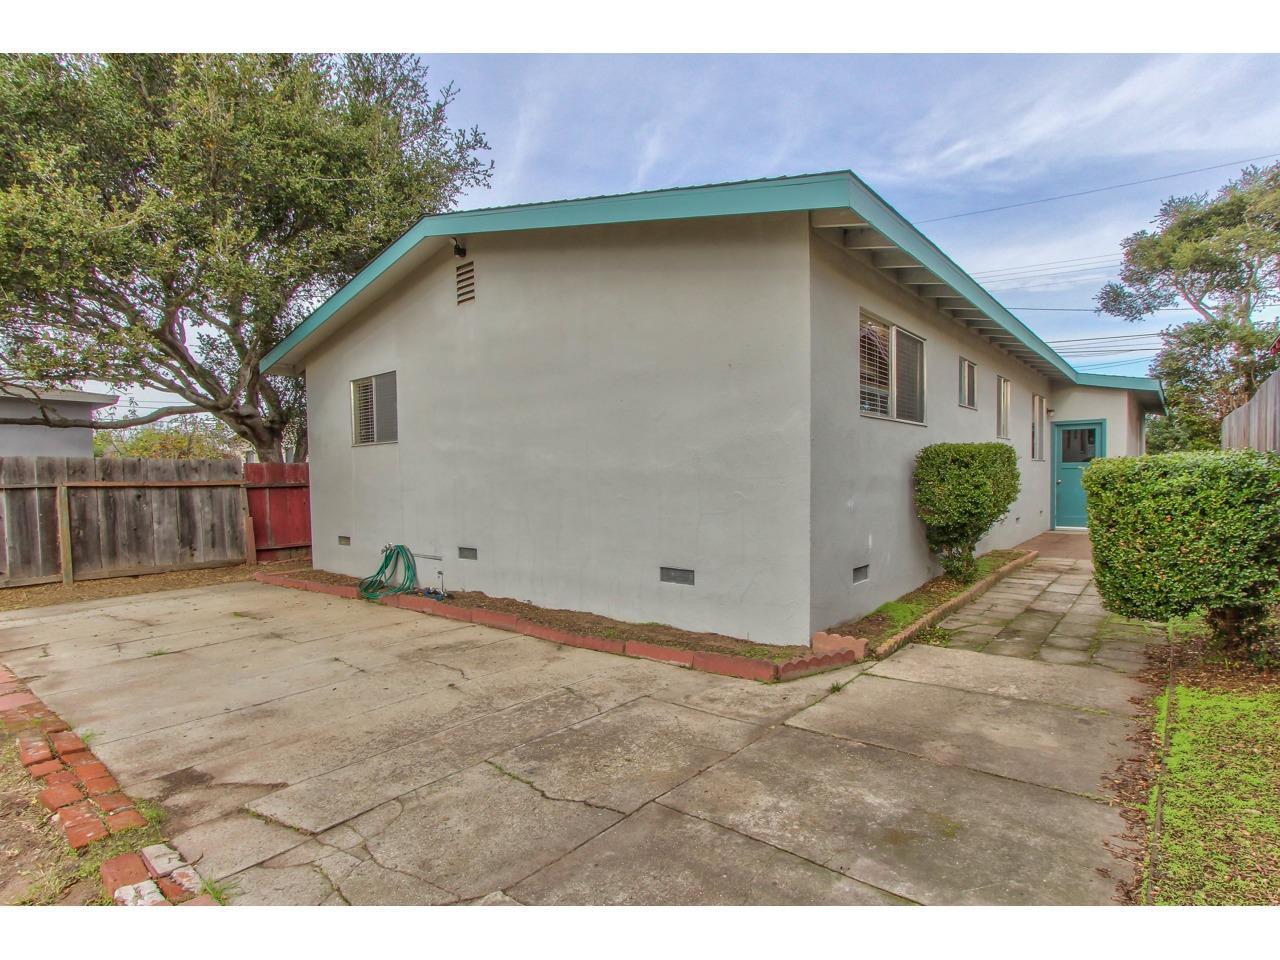 306 Del Robles Avenue Monterey, CA 93940 - MLS #: ML81732712